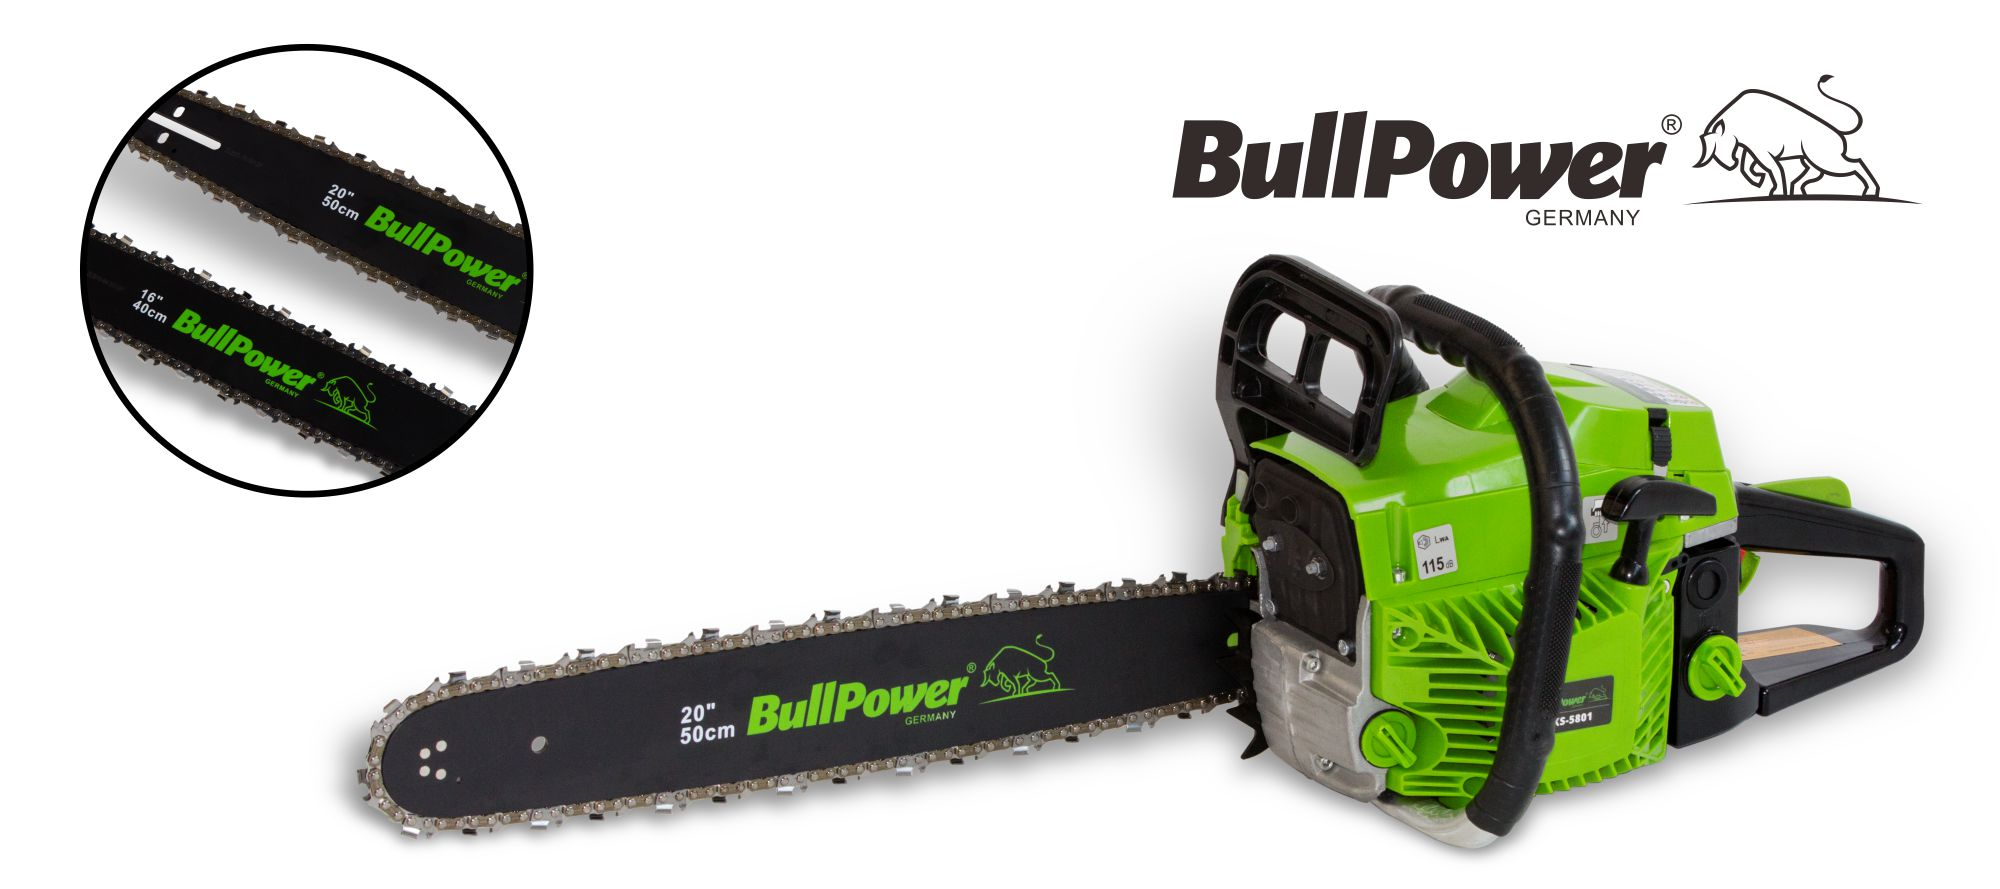 BullPower KS-5801 Benzin 58cc Kettensäge Motorsäge - 2 Schwerter, 2 Ketten 40cm + 50cm